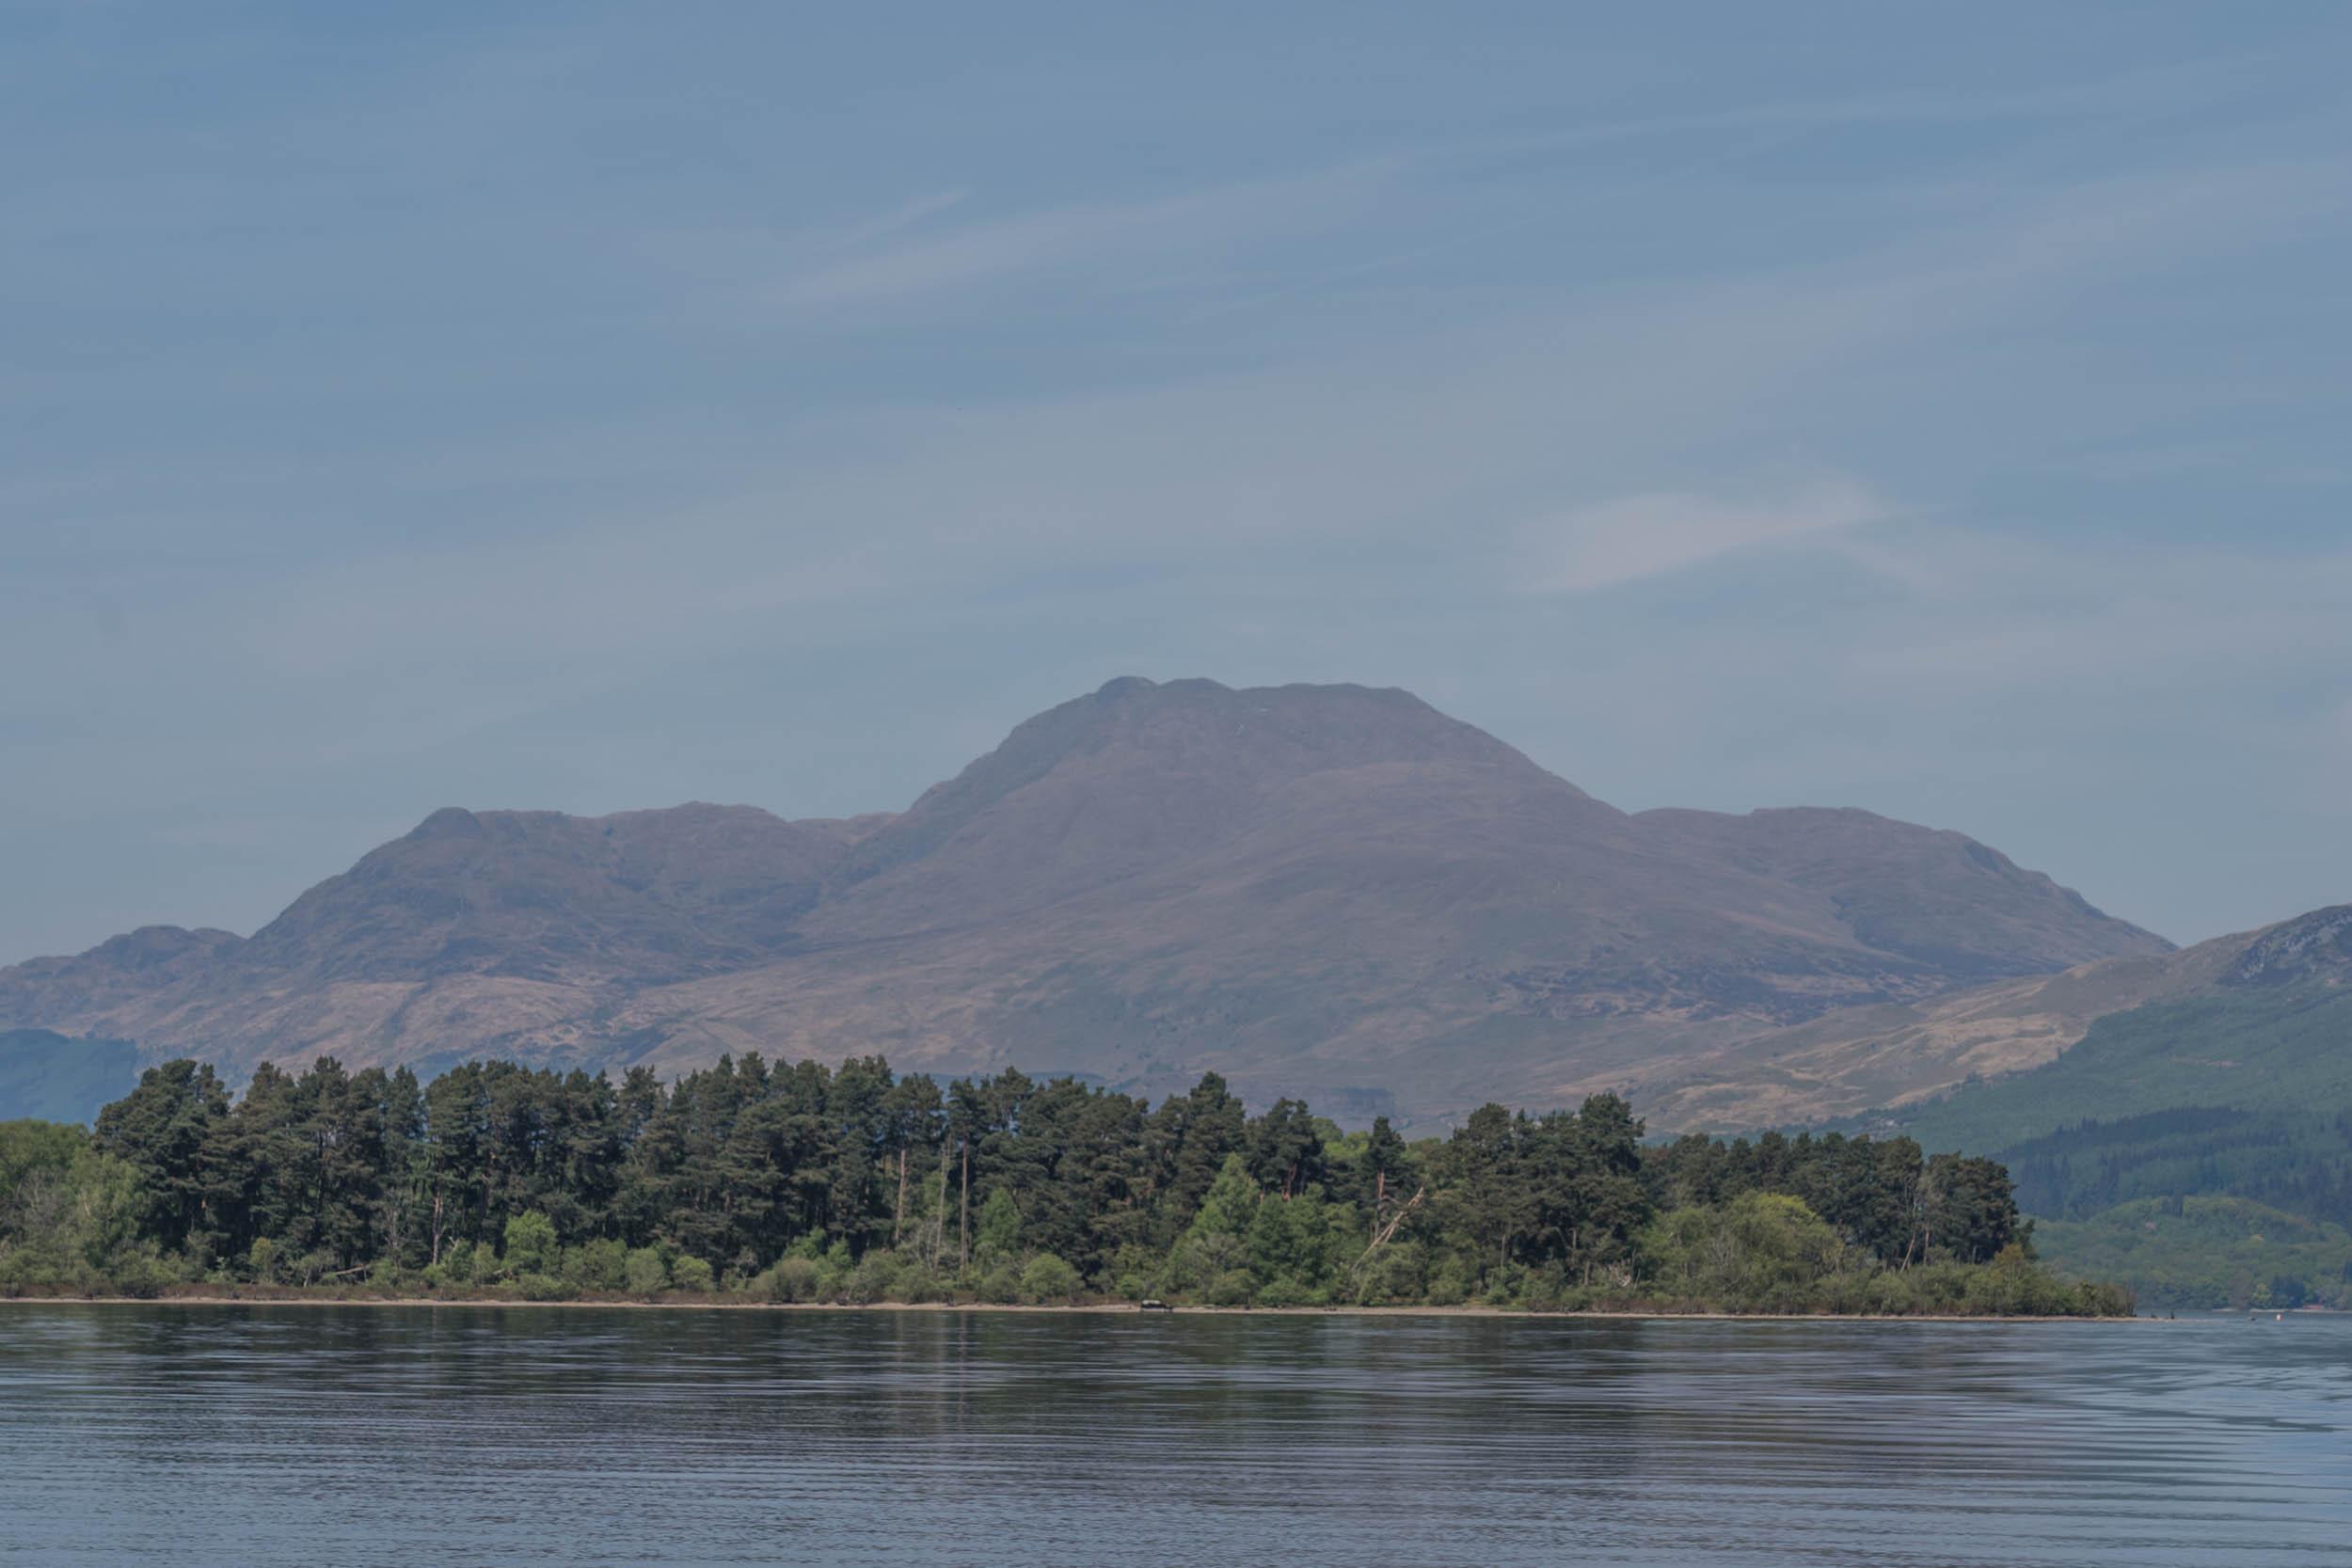 Bucinch Island, Loch Lomond